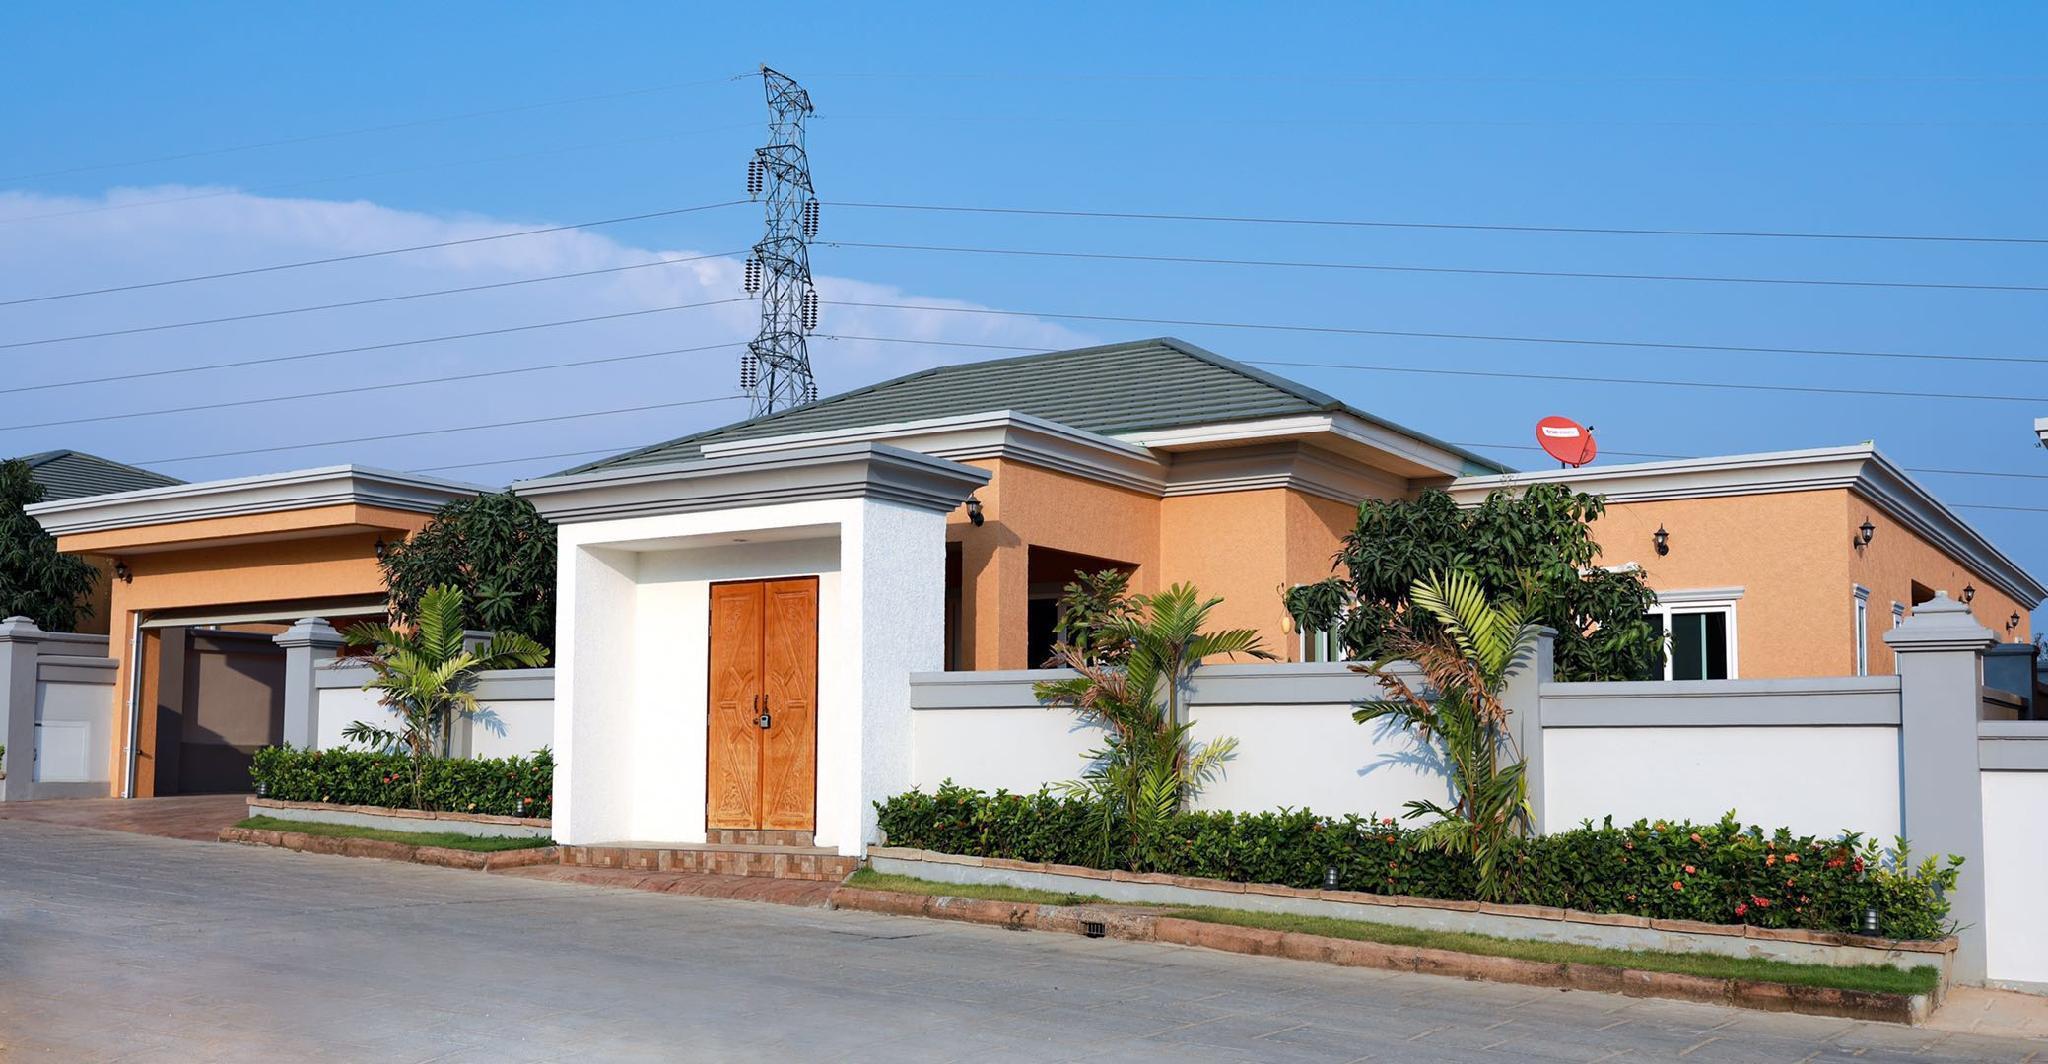 3.Pattaya's Top Luxury 4 Bedroom Pool Villa